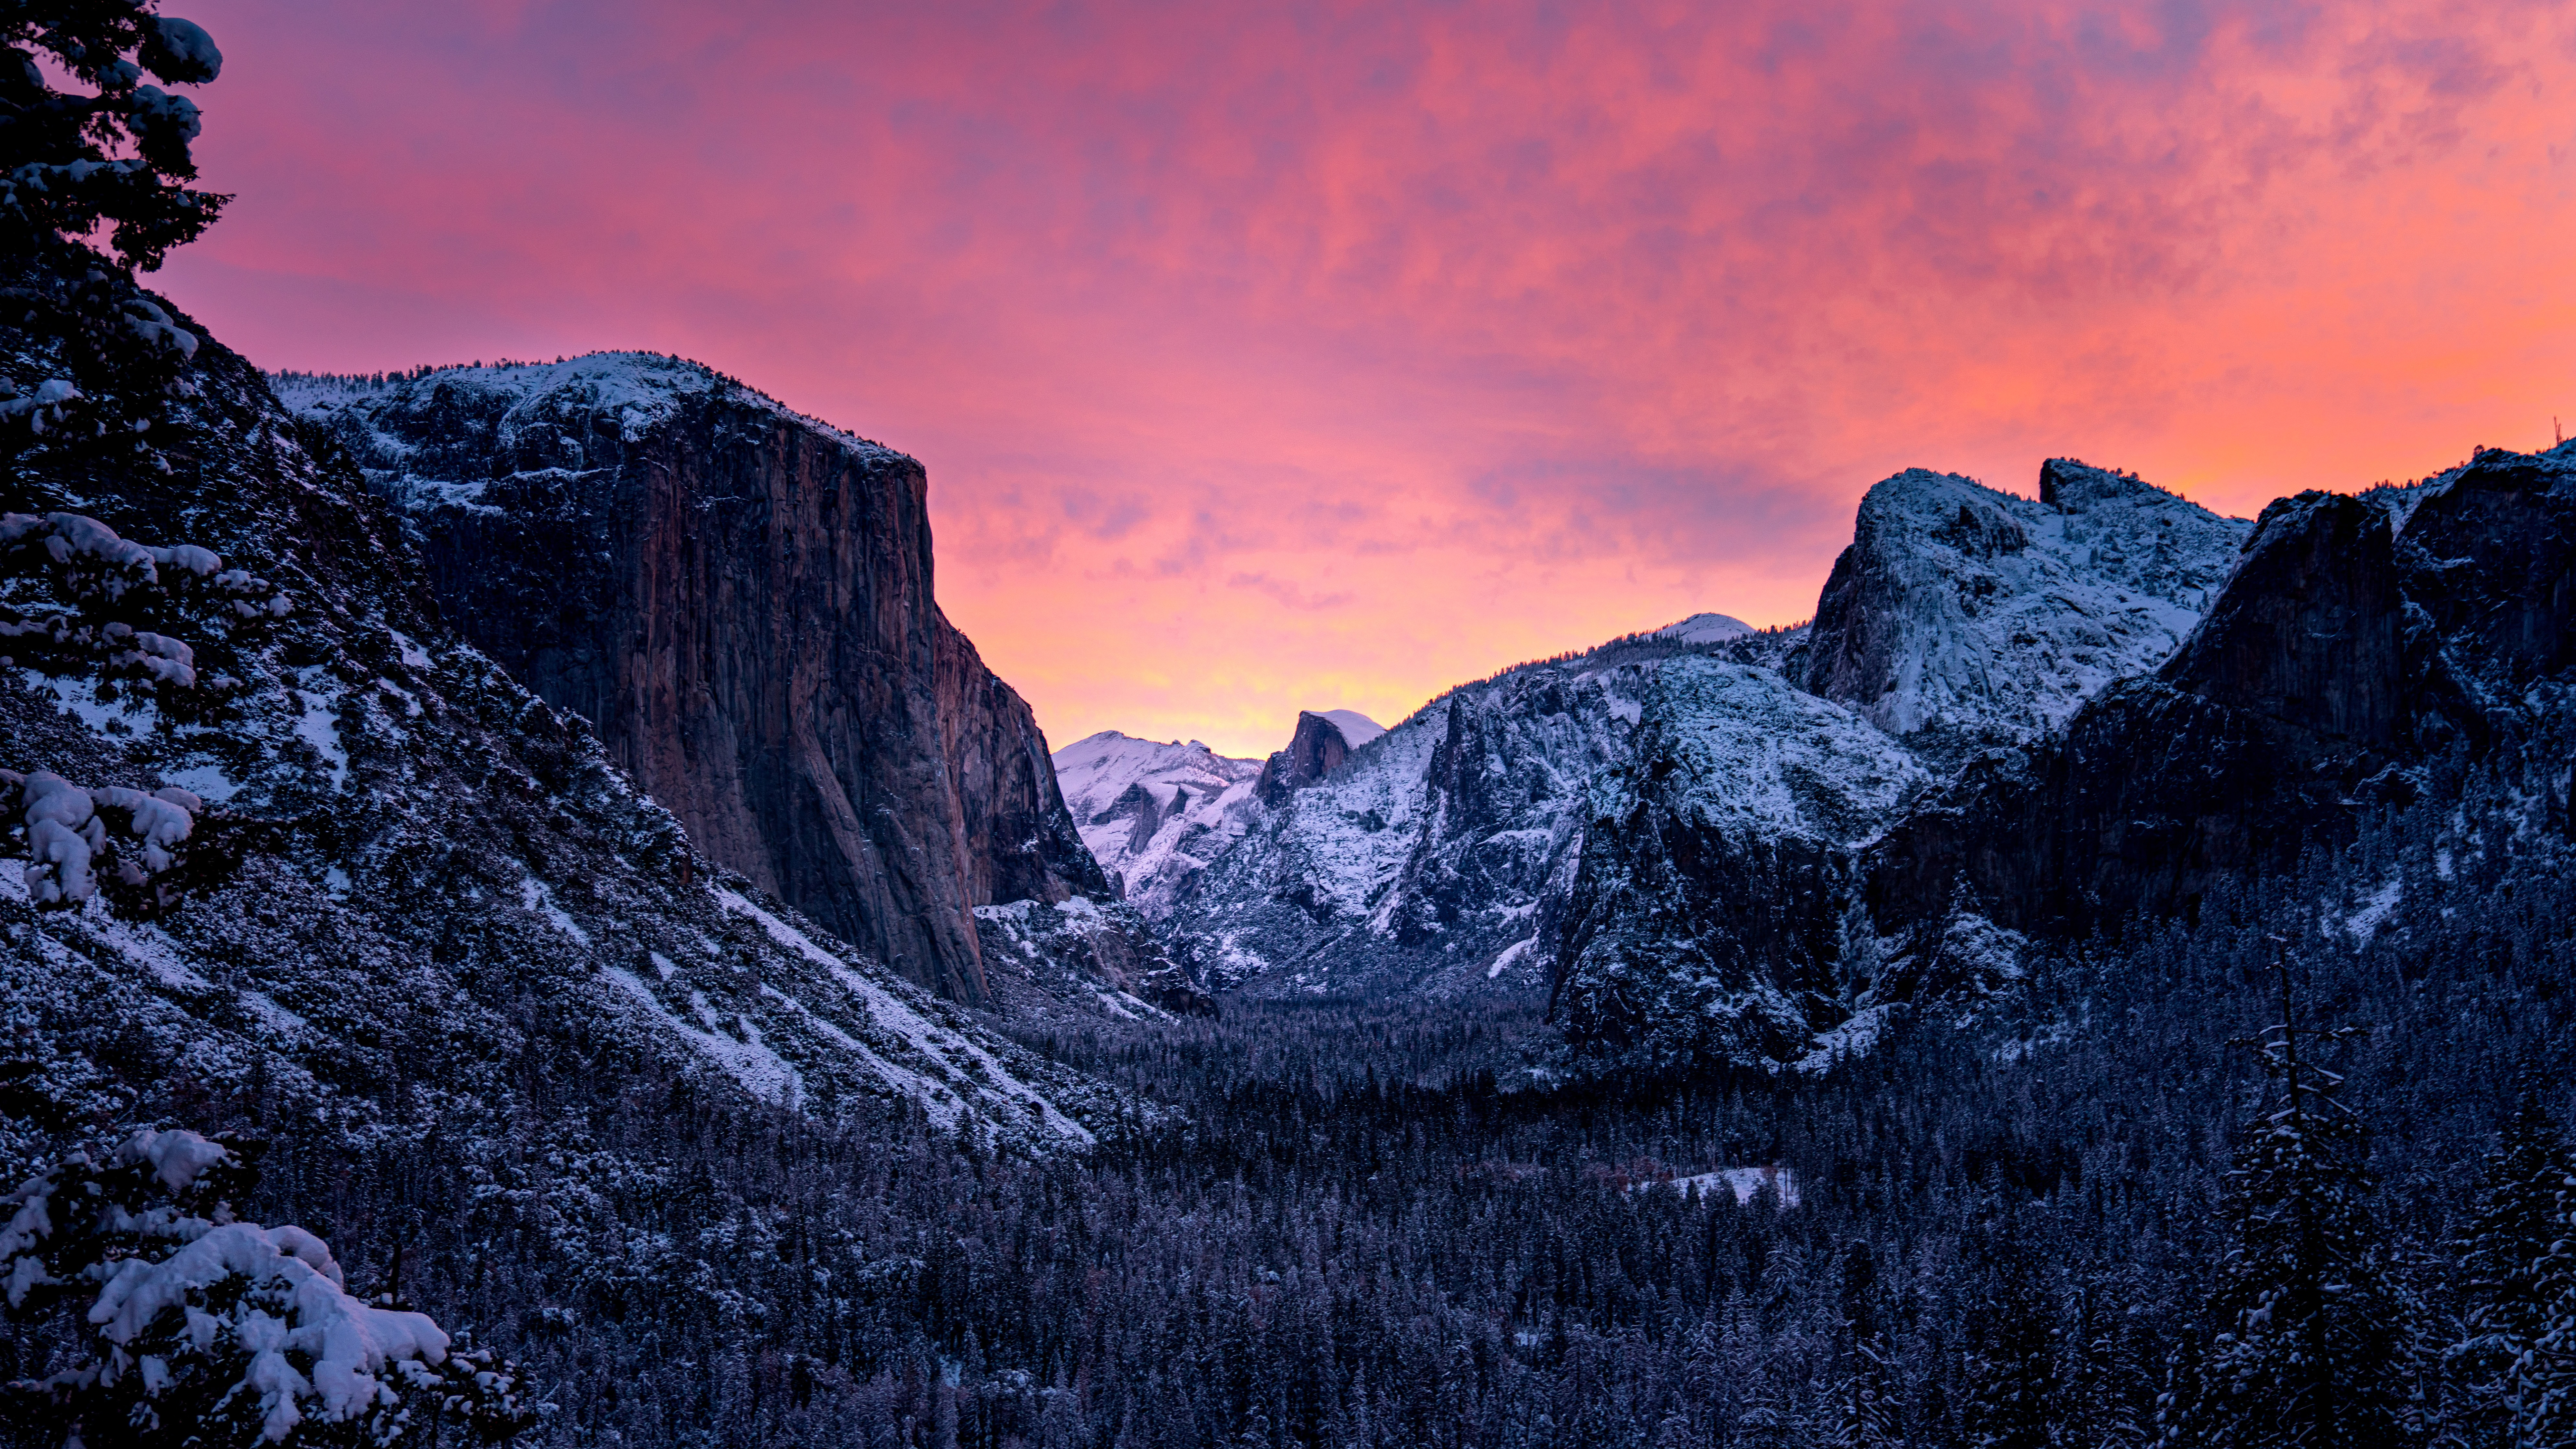 Mountain Yosemite National Park 7680x4320